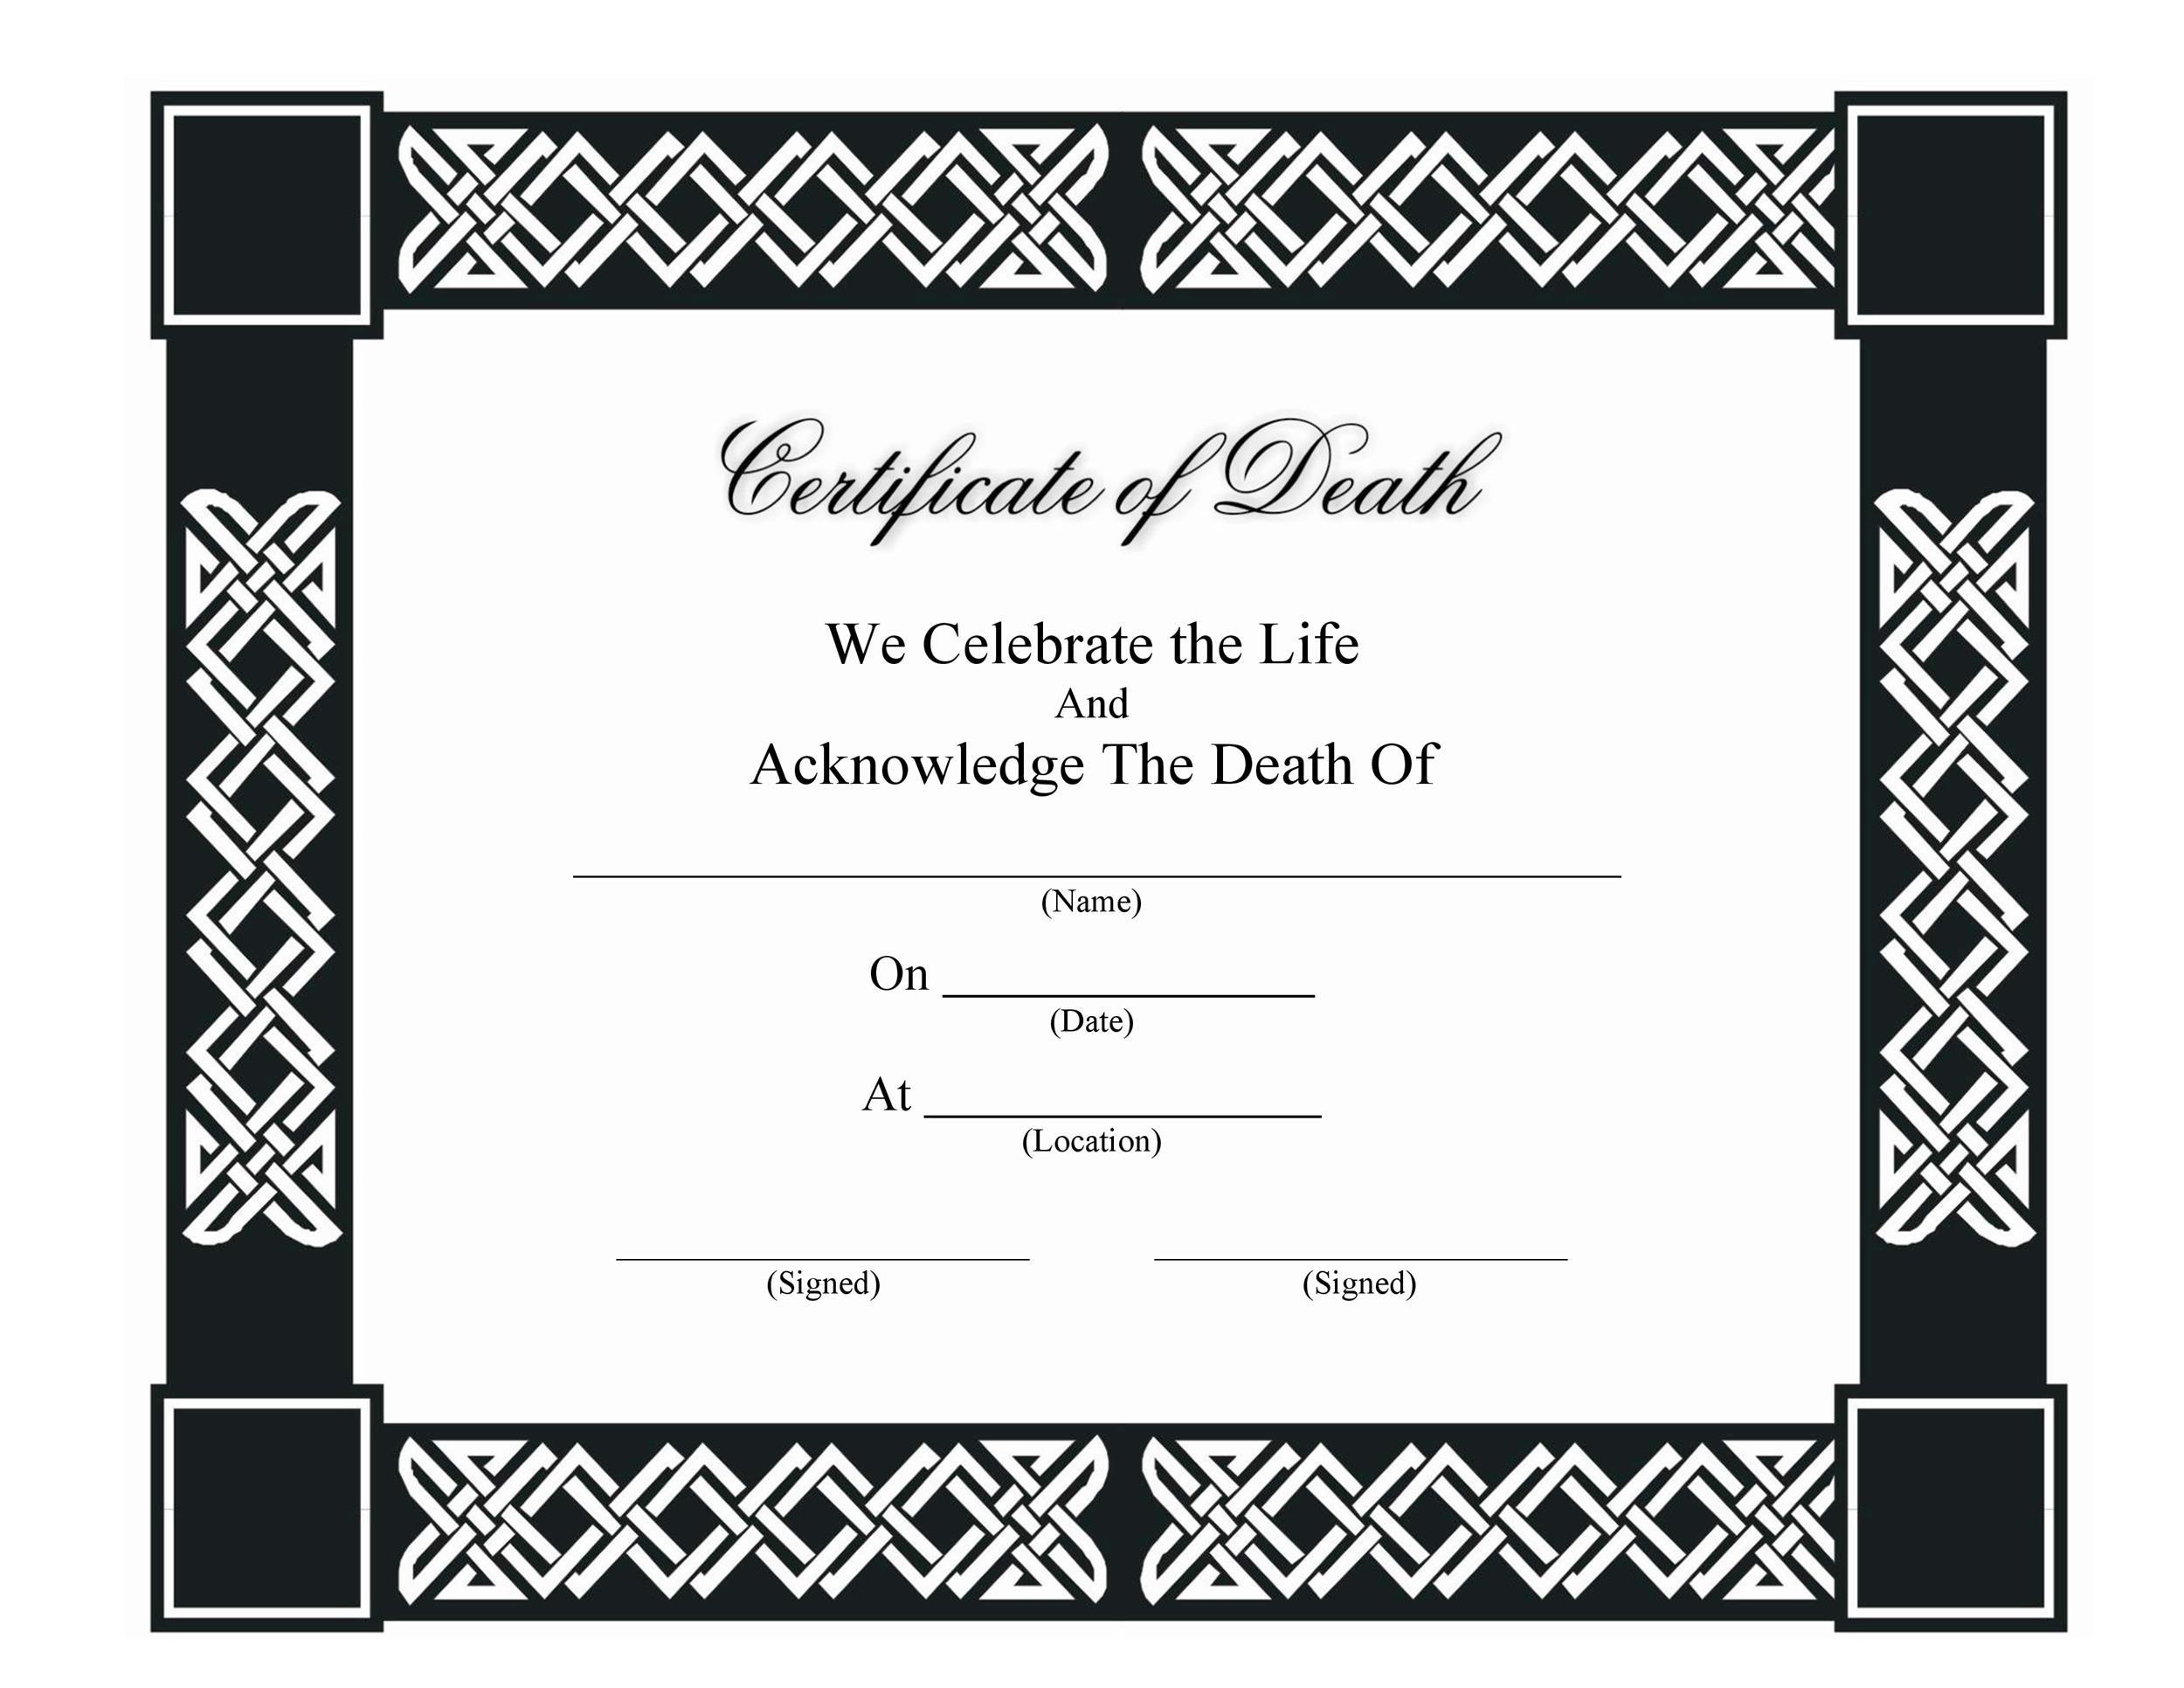 37 Blank Death Certificate Templates [100% FREE] ᐅ